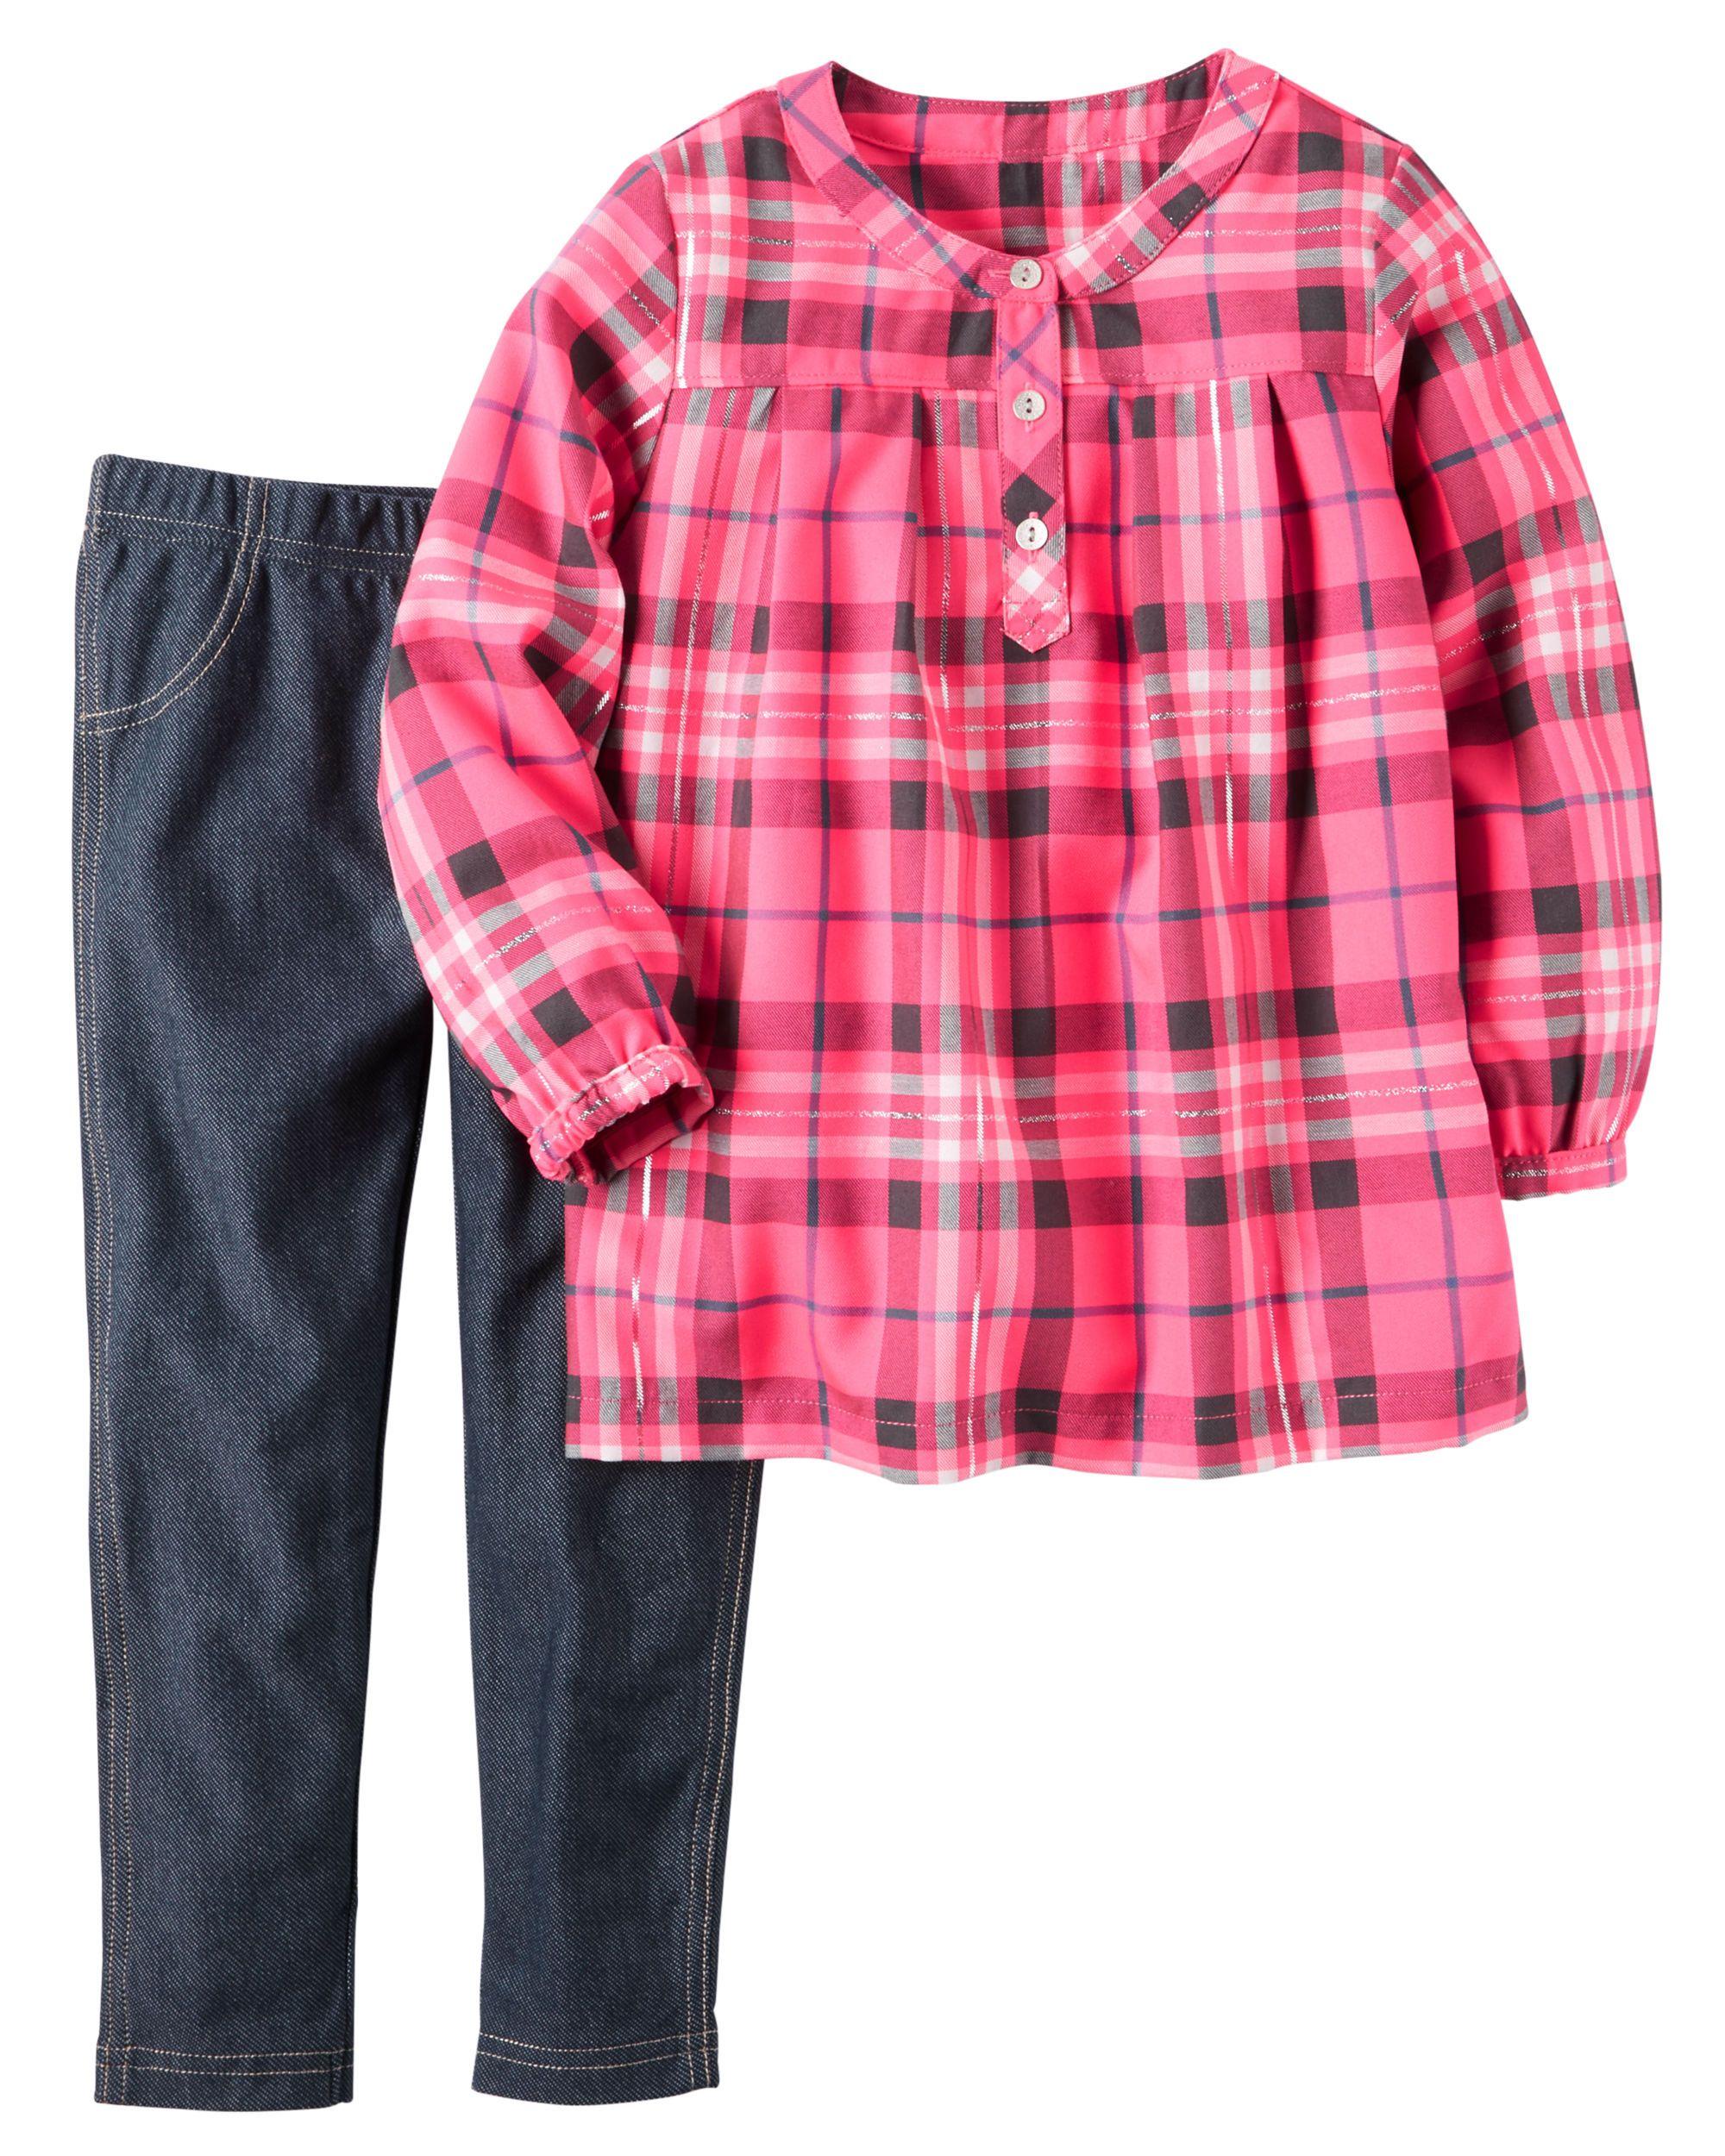 UK Toddler Kid Baby Boy Clothes T-Shirt Top Long Leggings 2PC Cotton Outfits Set